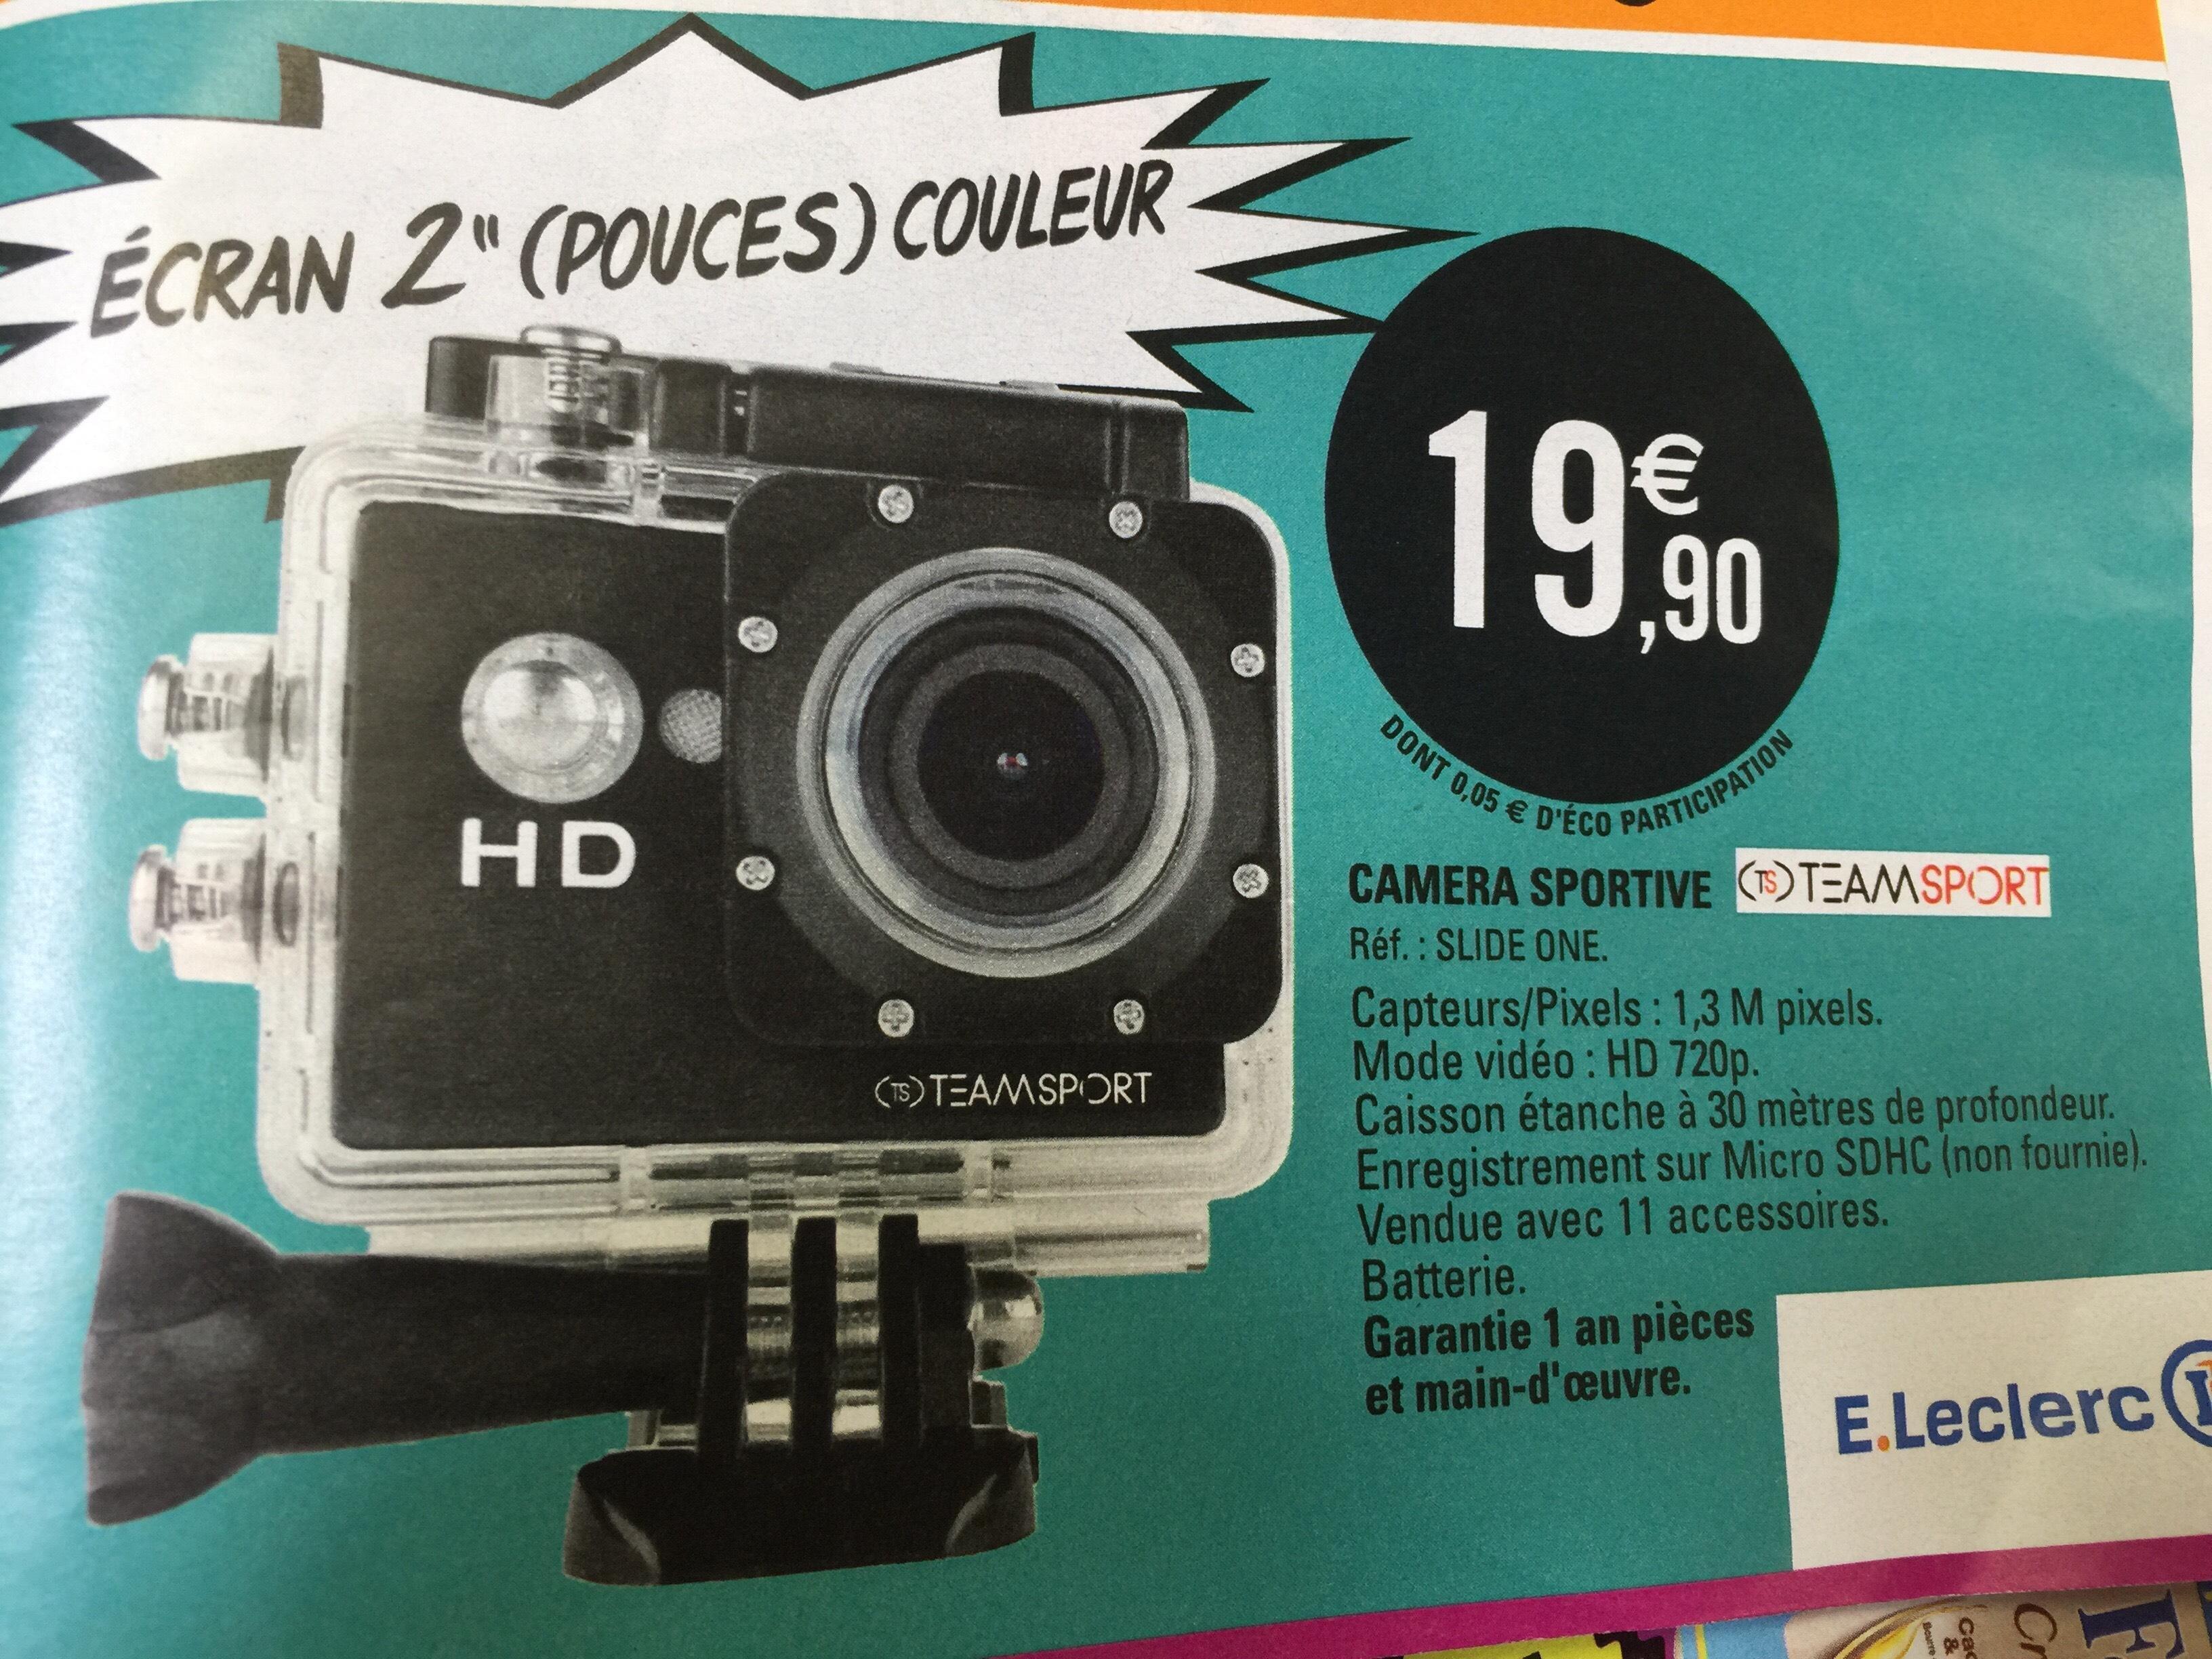 Camera Sportive TeamSport Slide One - HD